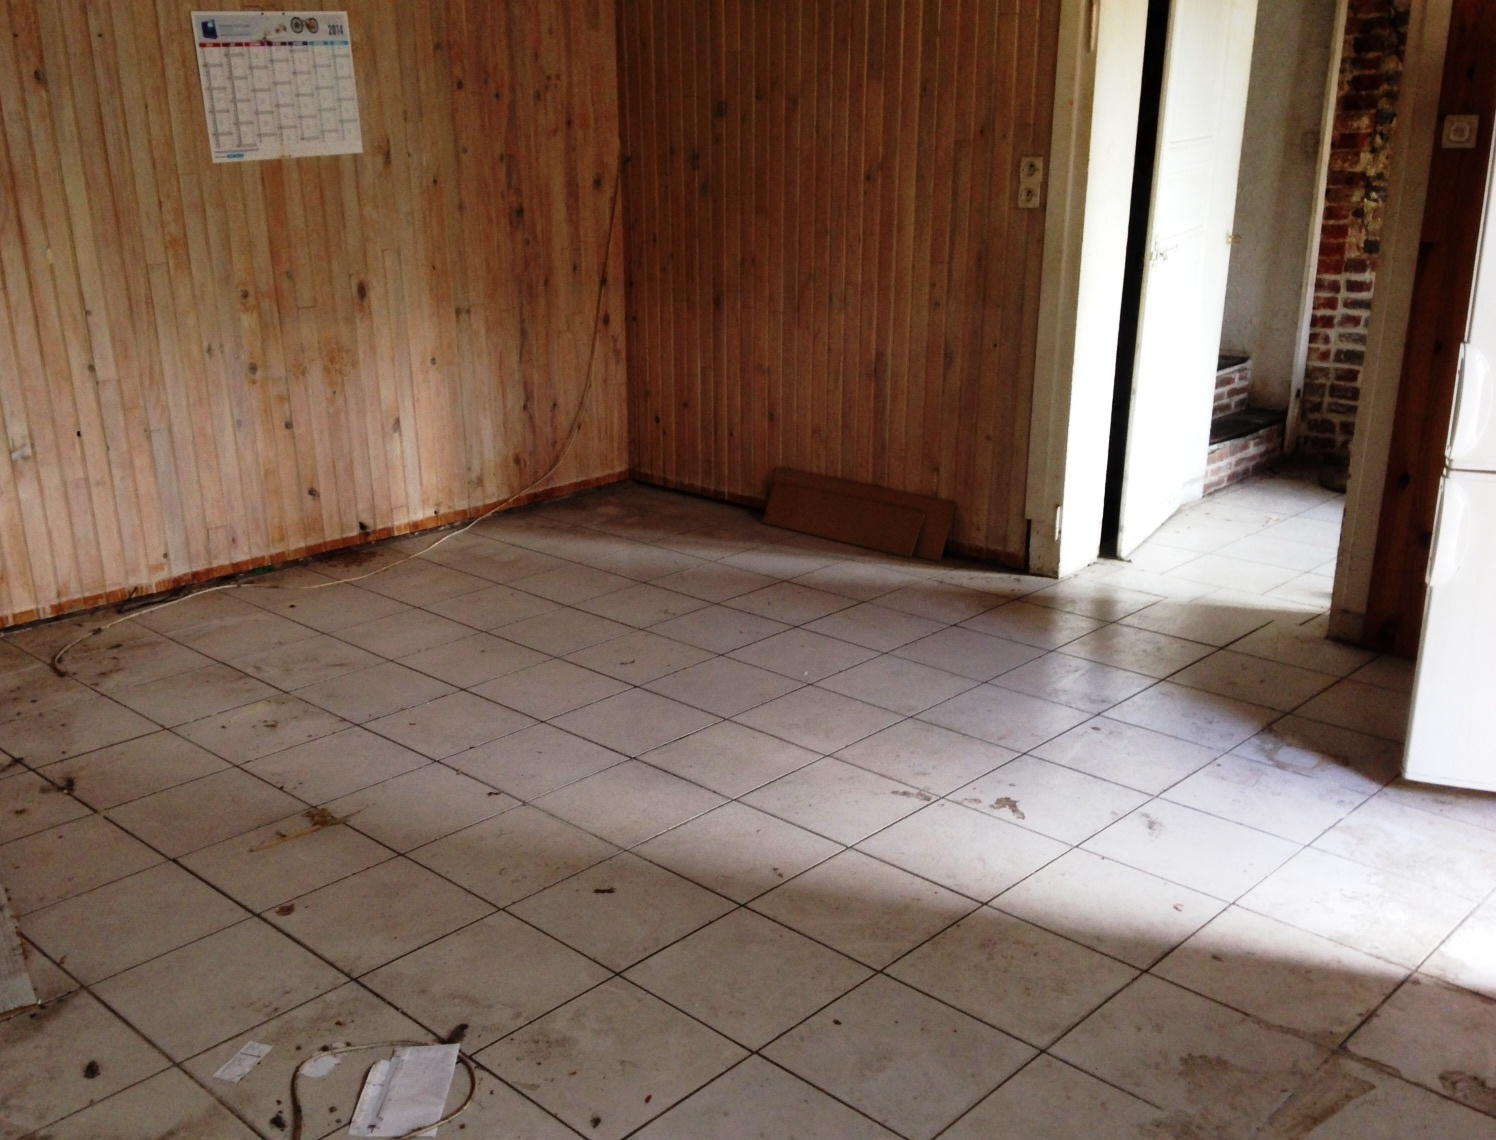 Vente maison pour investissement ou 1er achat 2 chambres for Acheter garage investissement